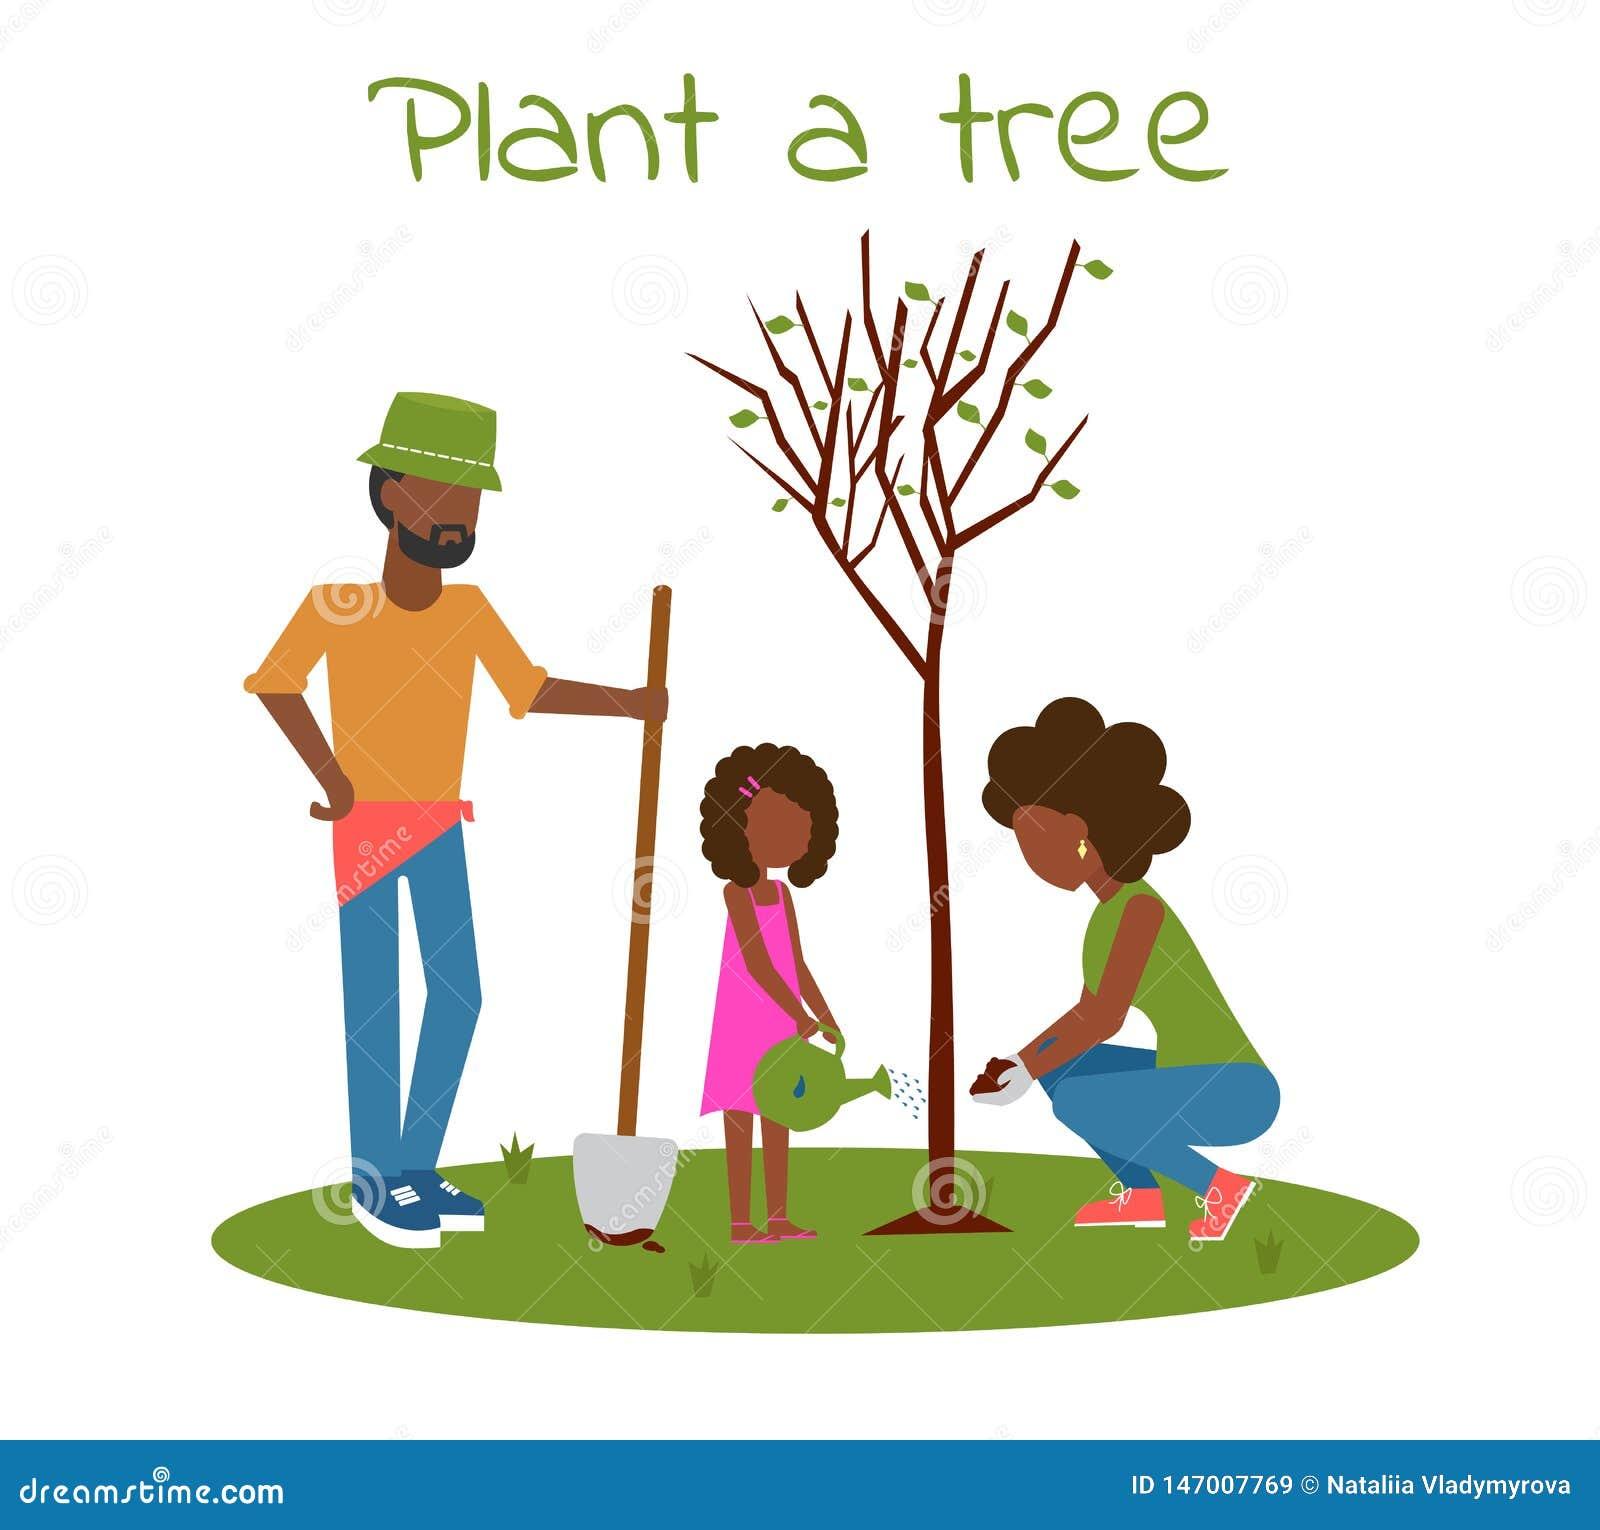 Plant a tree afro happy family